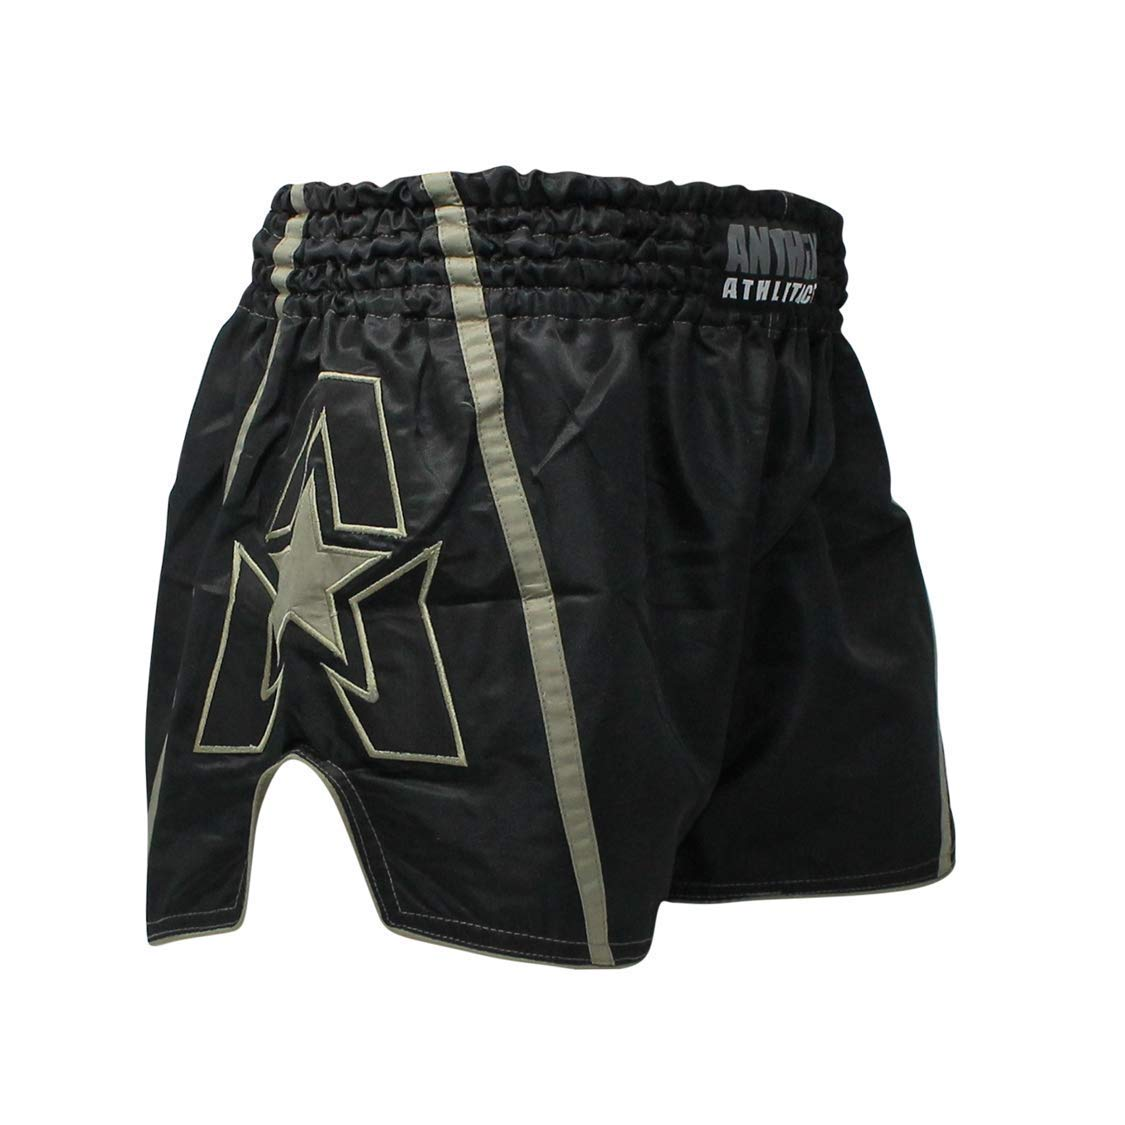 db7a82fb1c Cleto Reyes Satin Boxing Robe with Hood - Black Gold  1541650295 ...